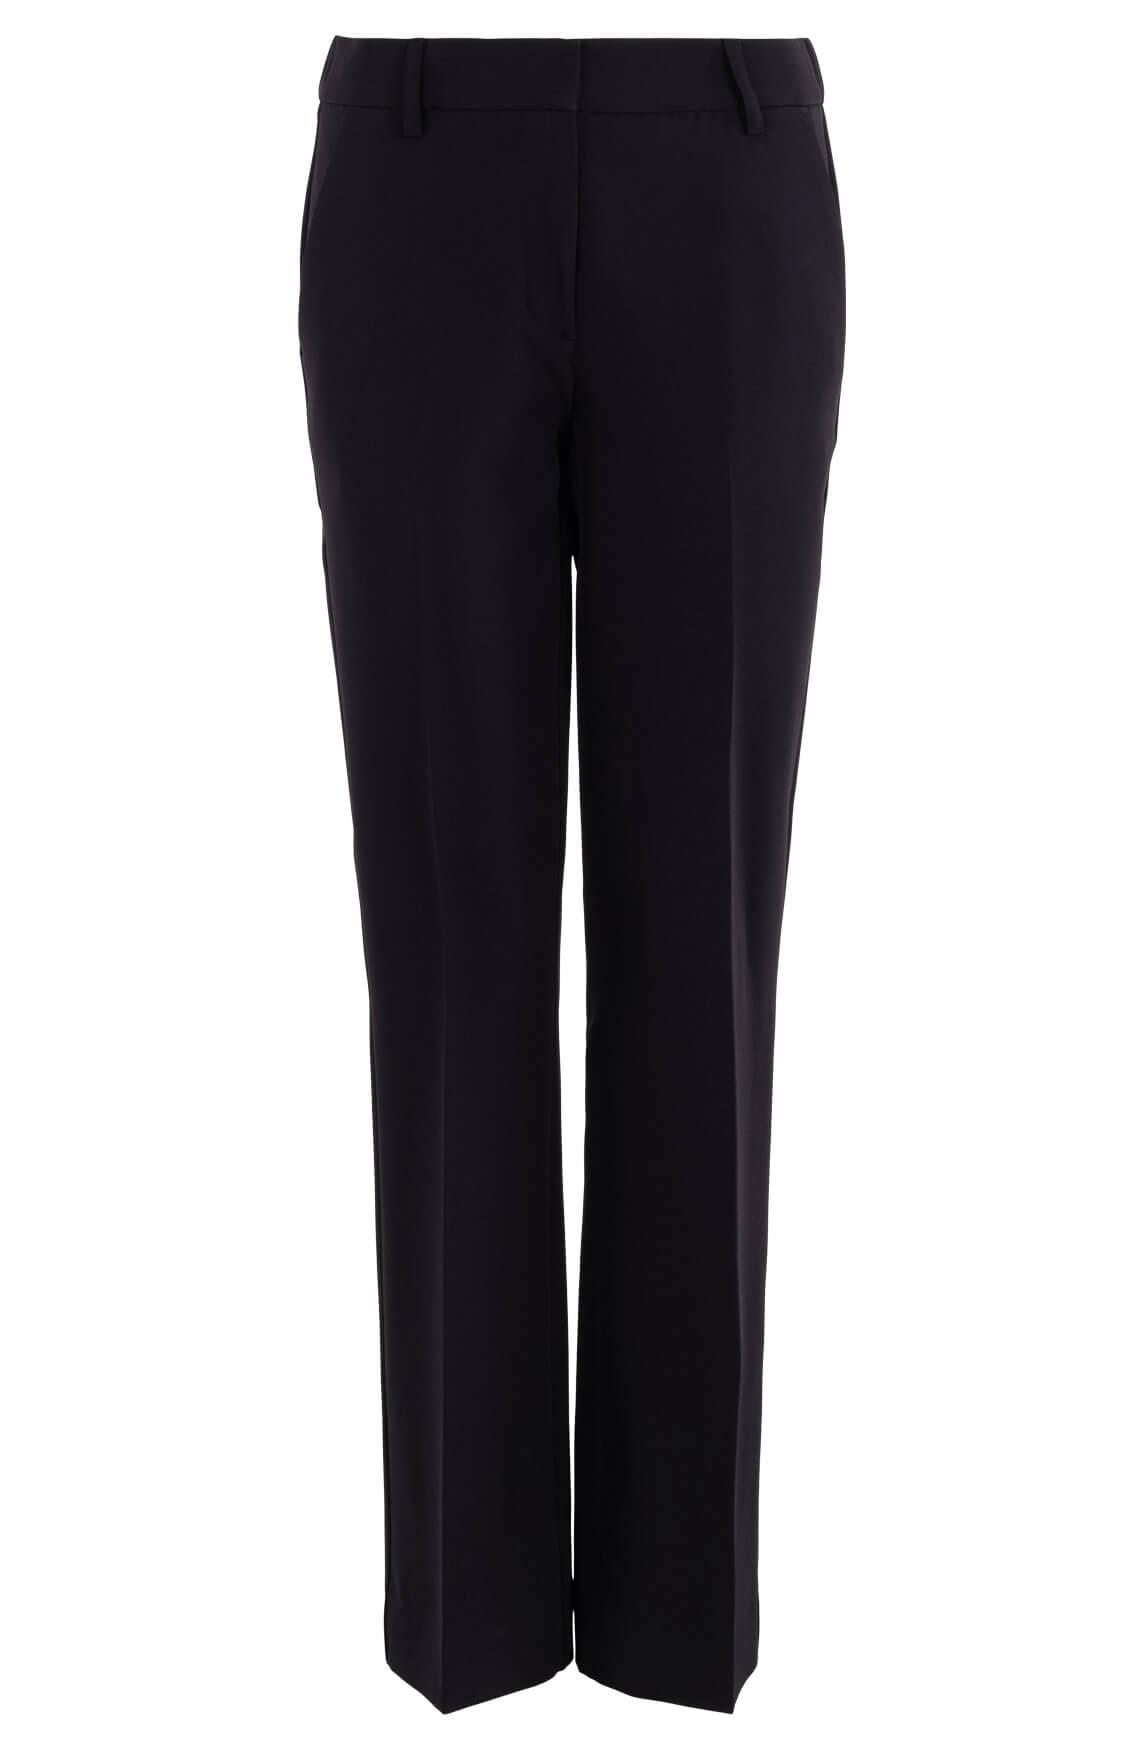 Levete Room Dames Helena pantalon Zwart